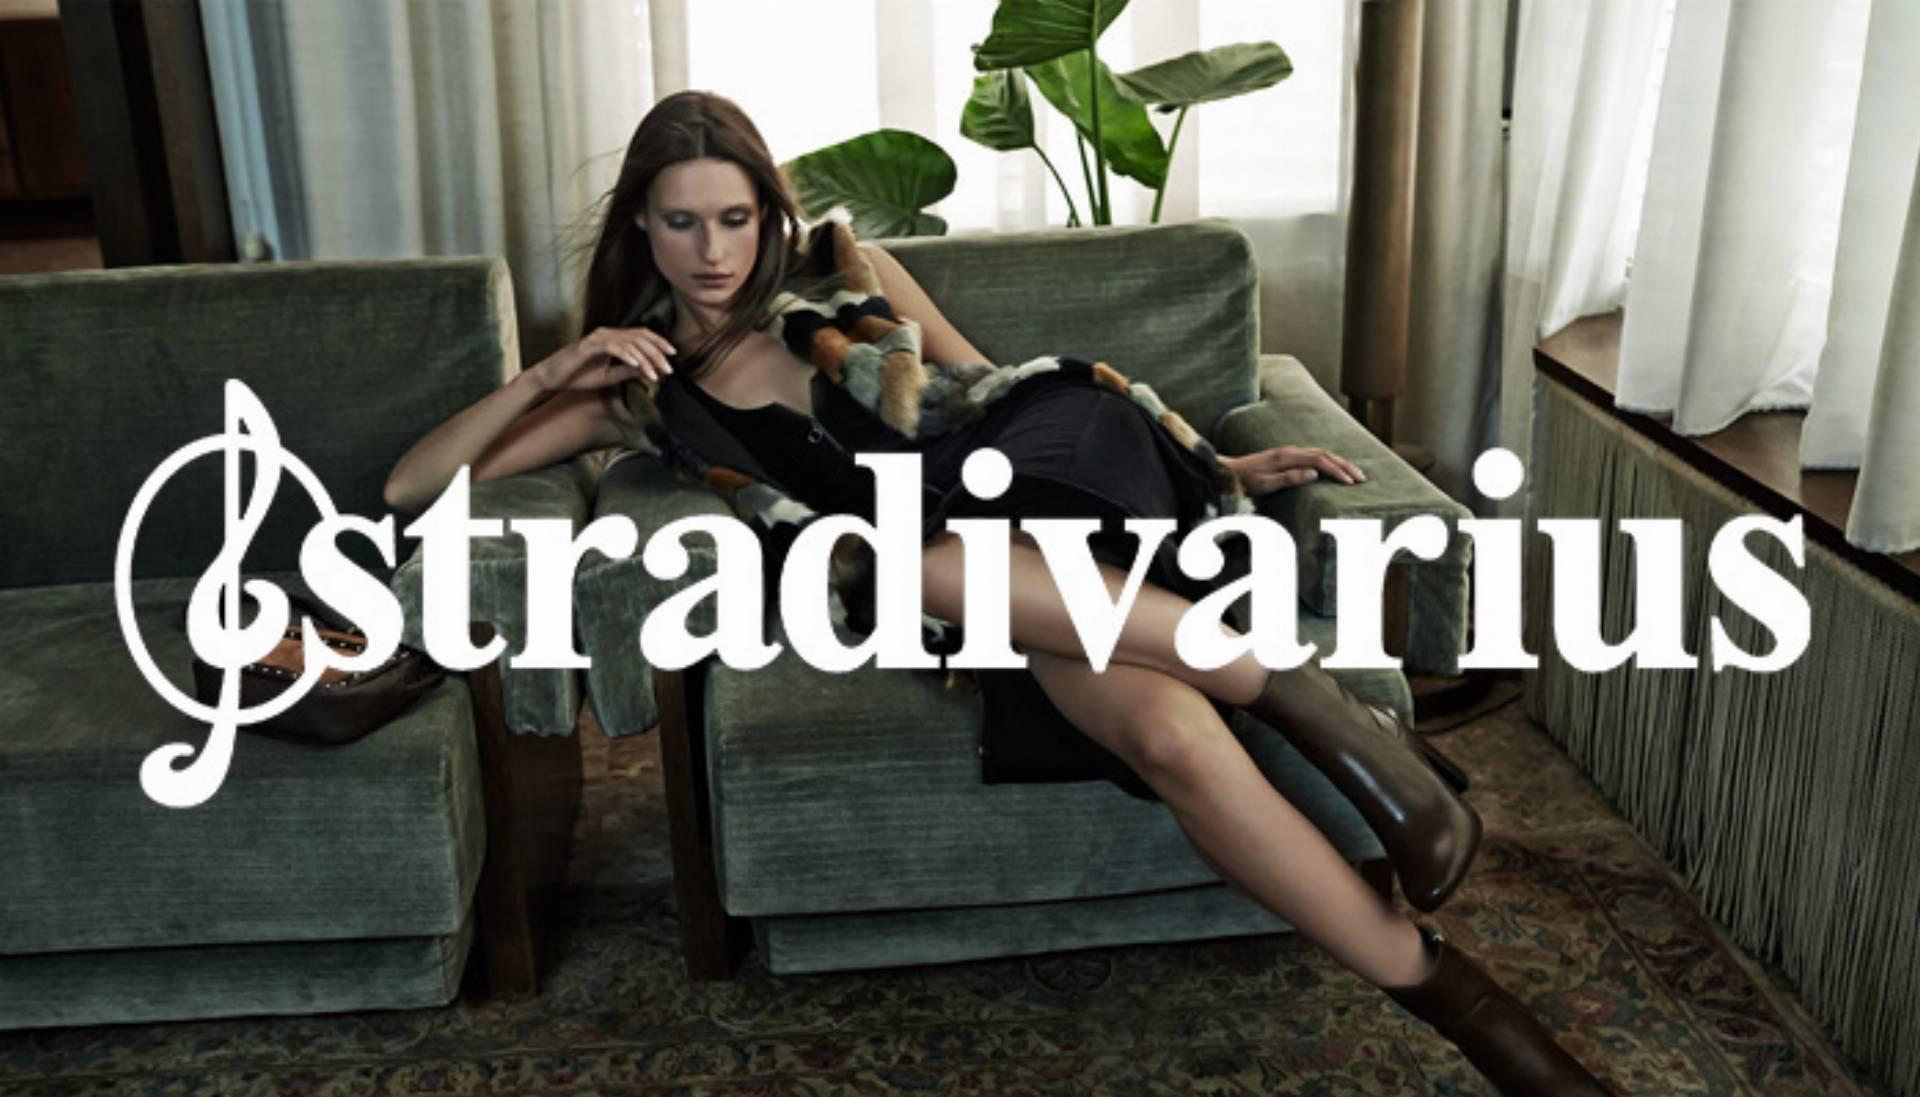 Stradivarius na sezon jesień-zima 2015-2016 log